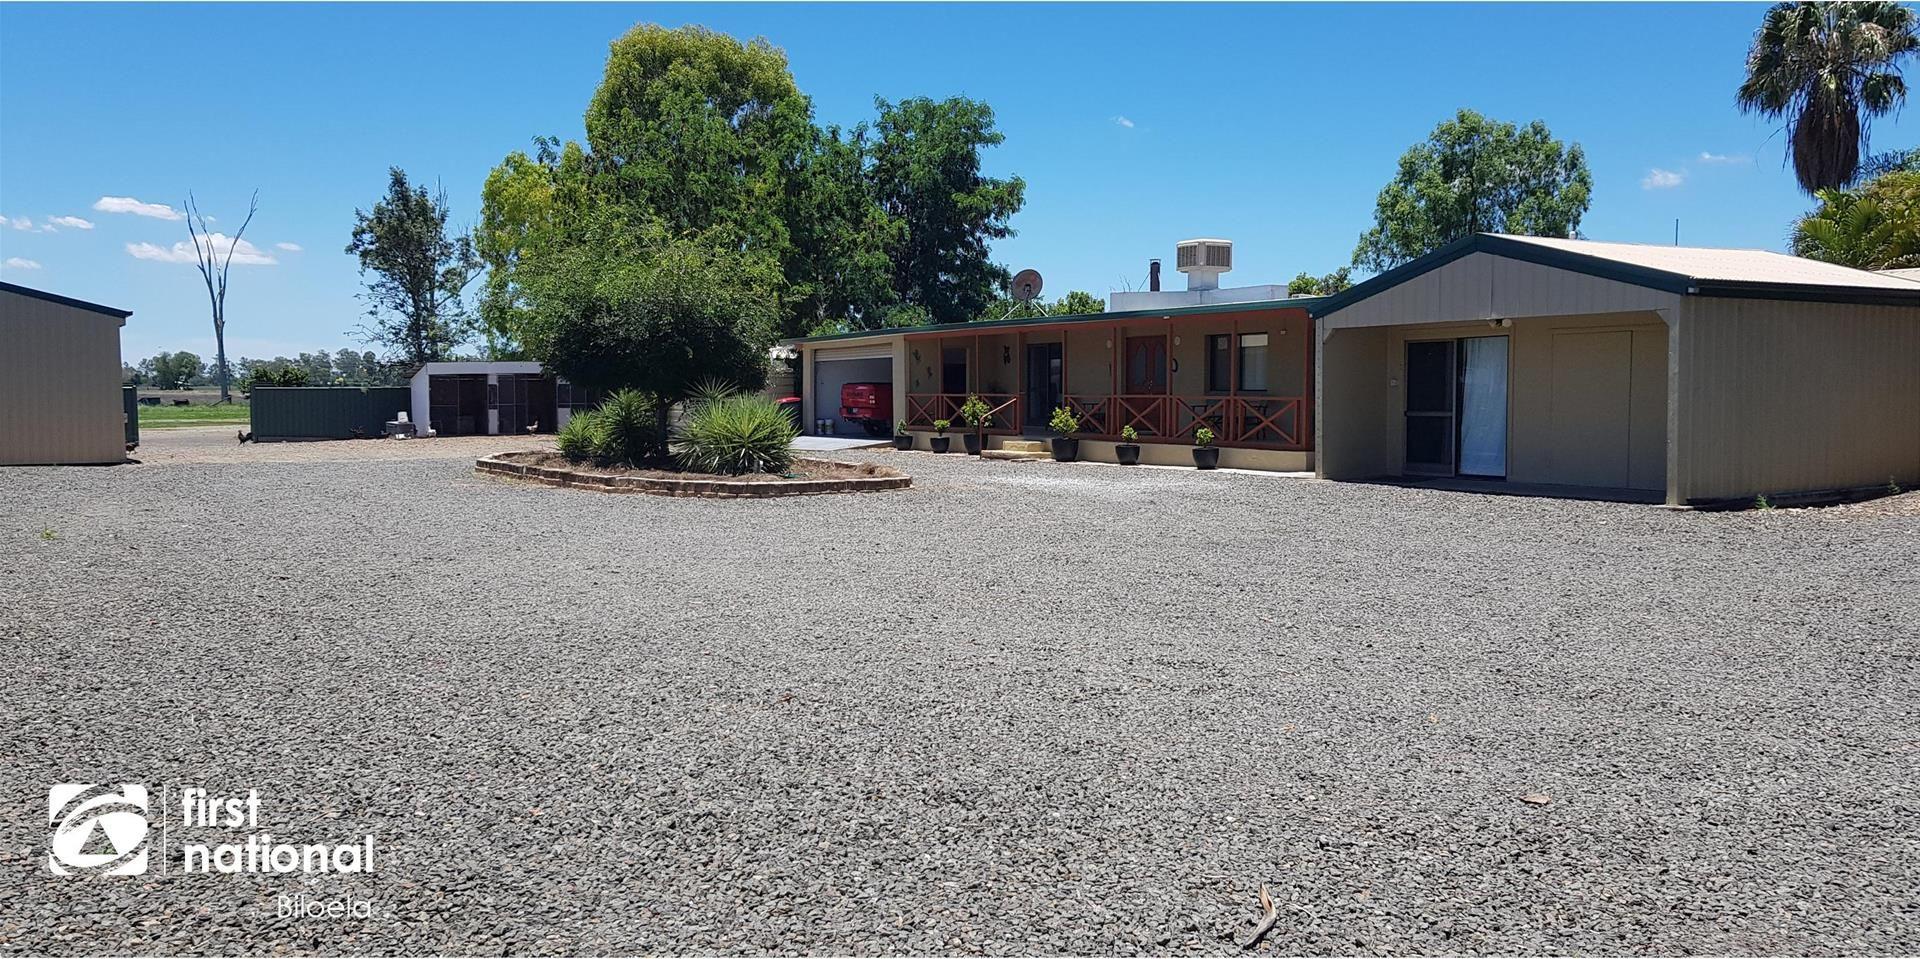 40894 Burnett Highway, Biloela QLD 4715, Image 0